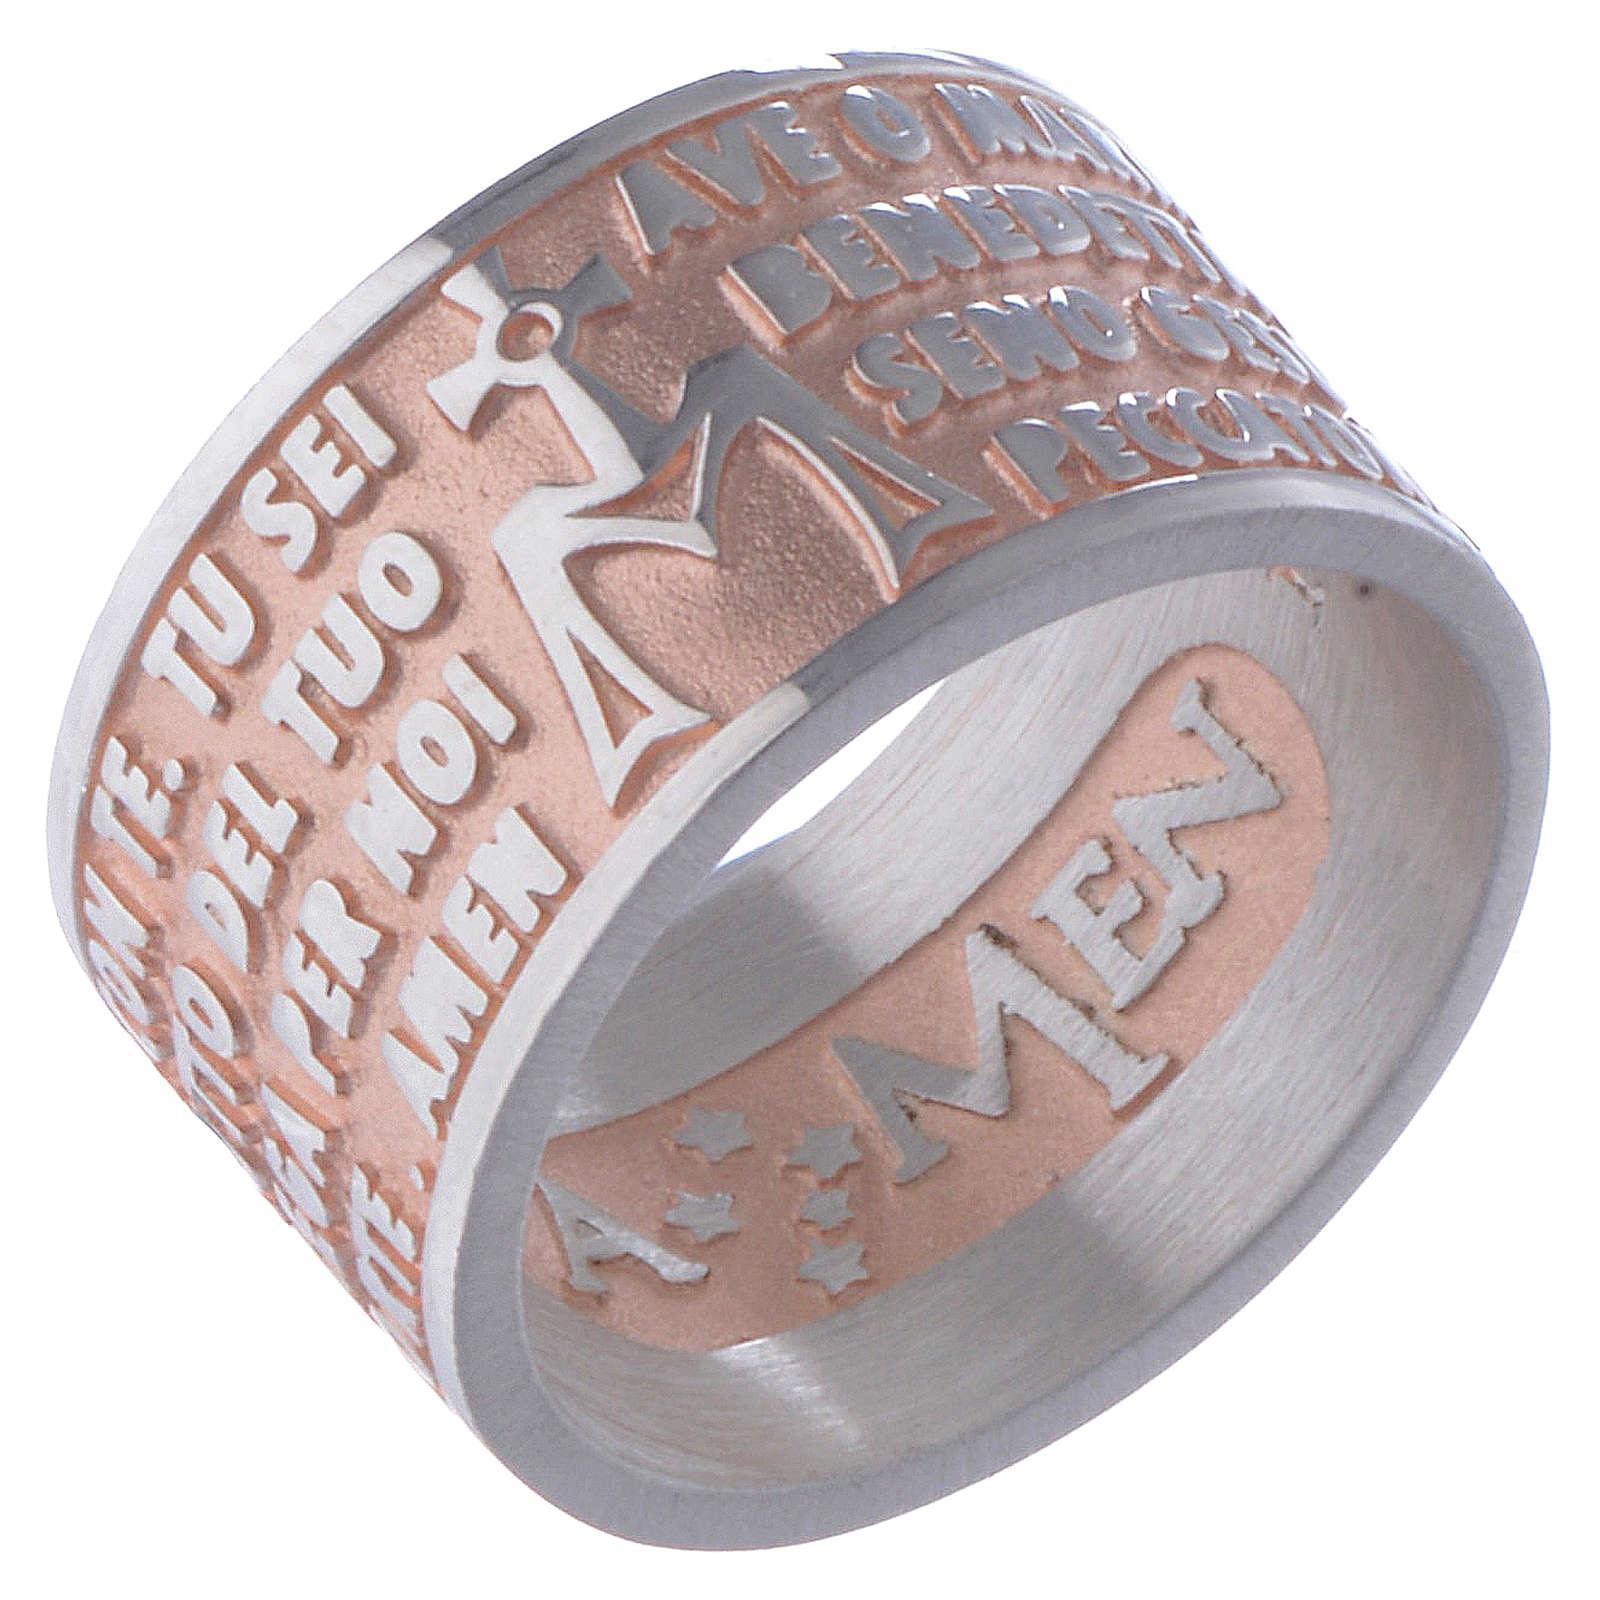 Hail Mary prayer ring in silver rosé AMEN 3